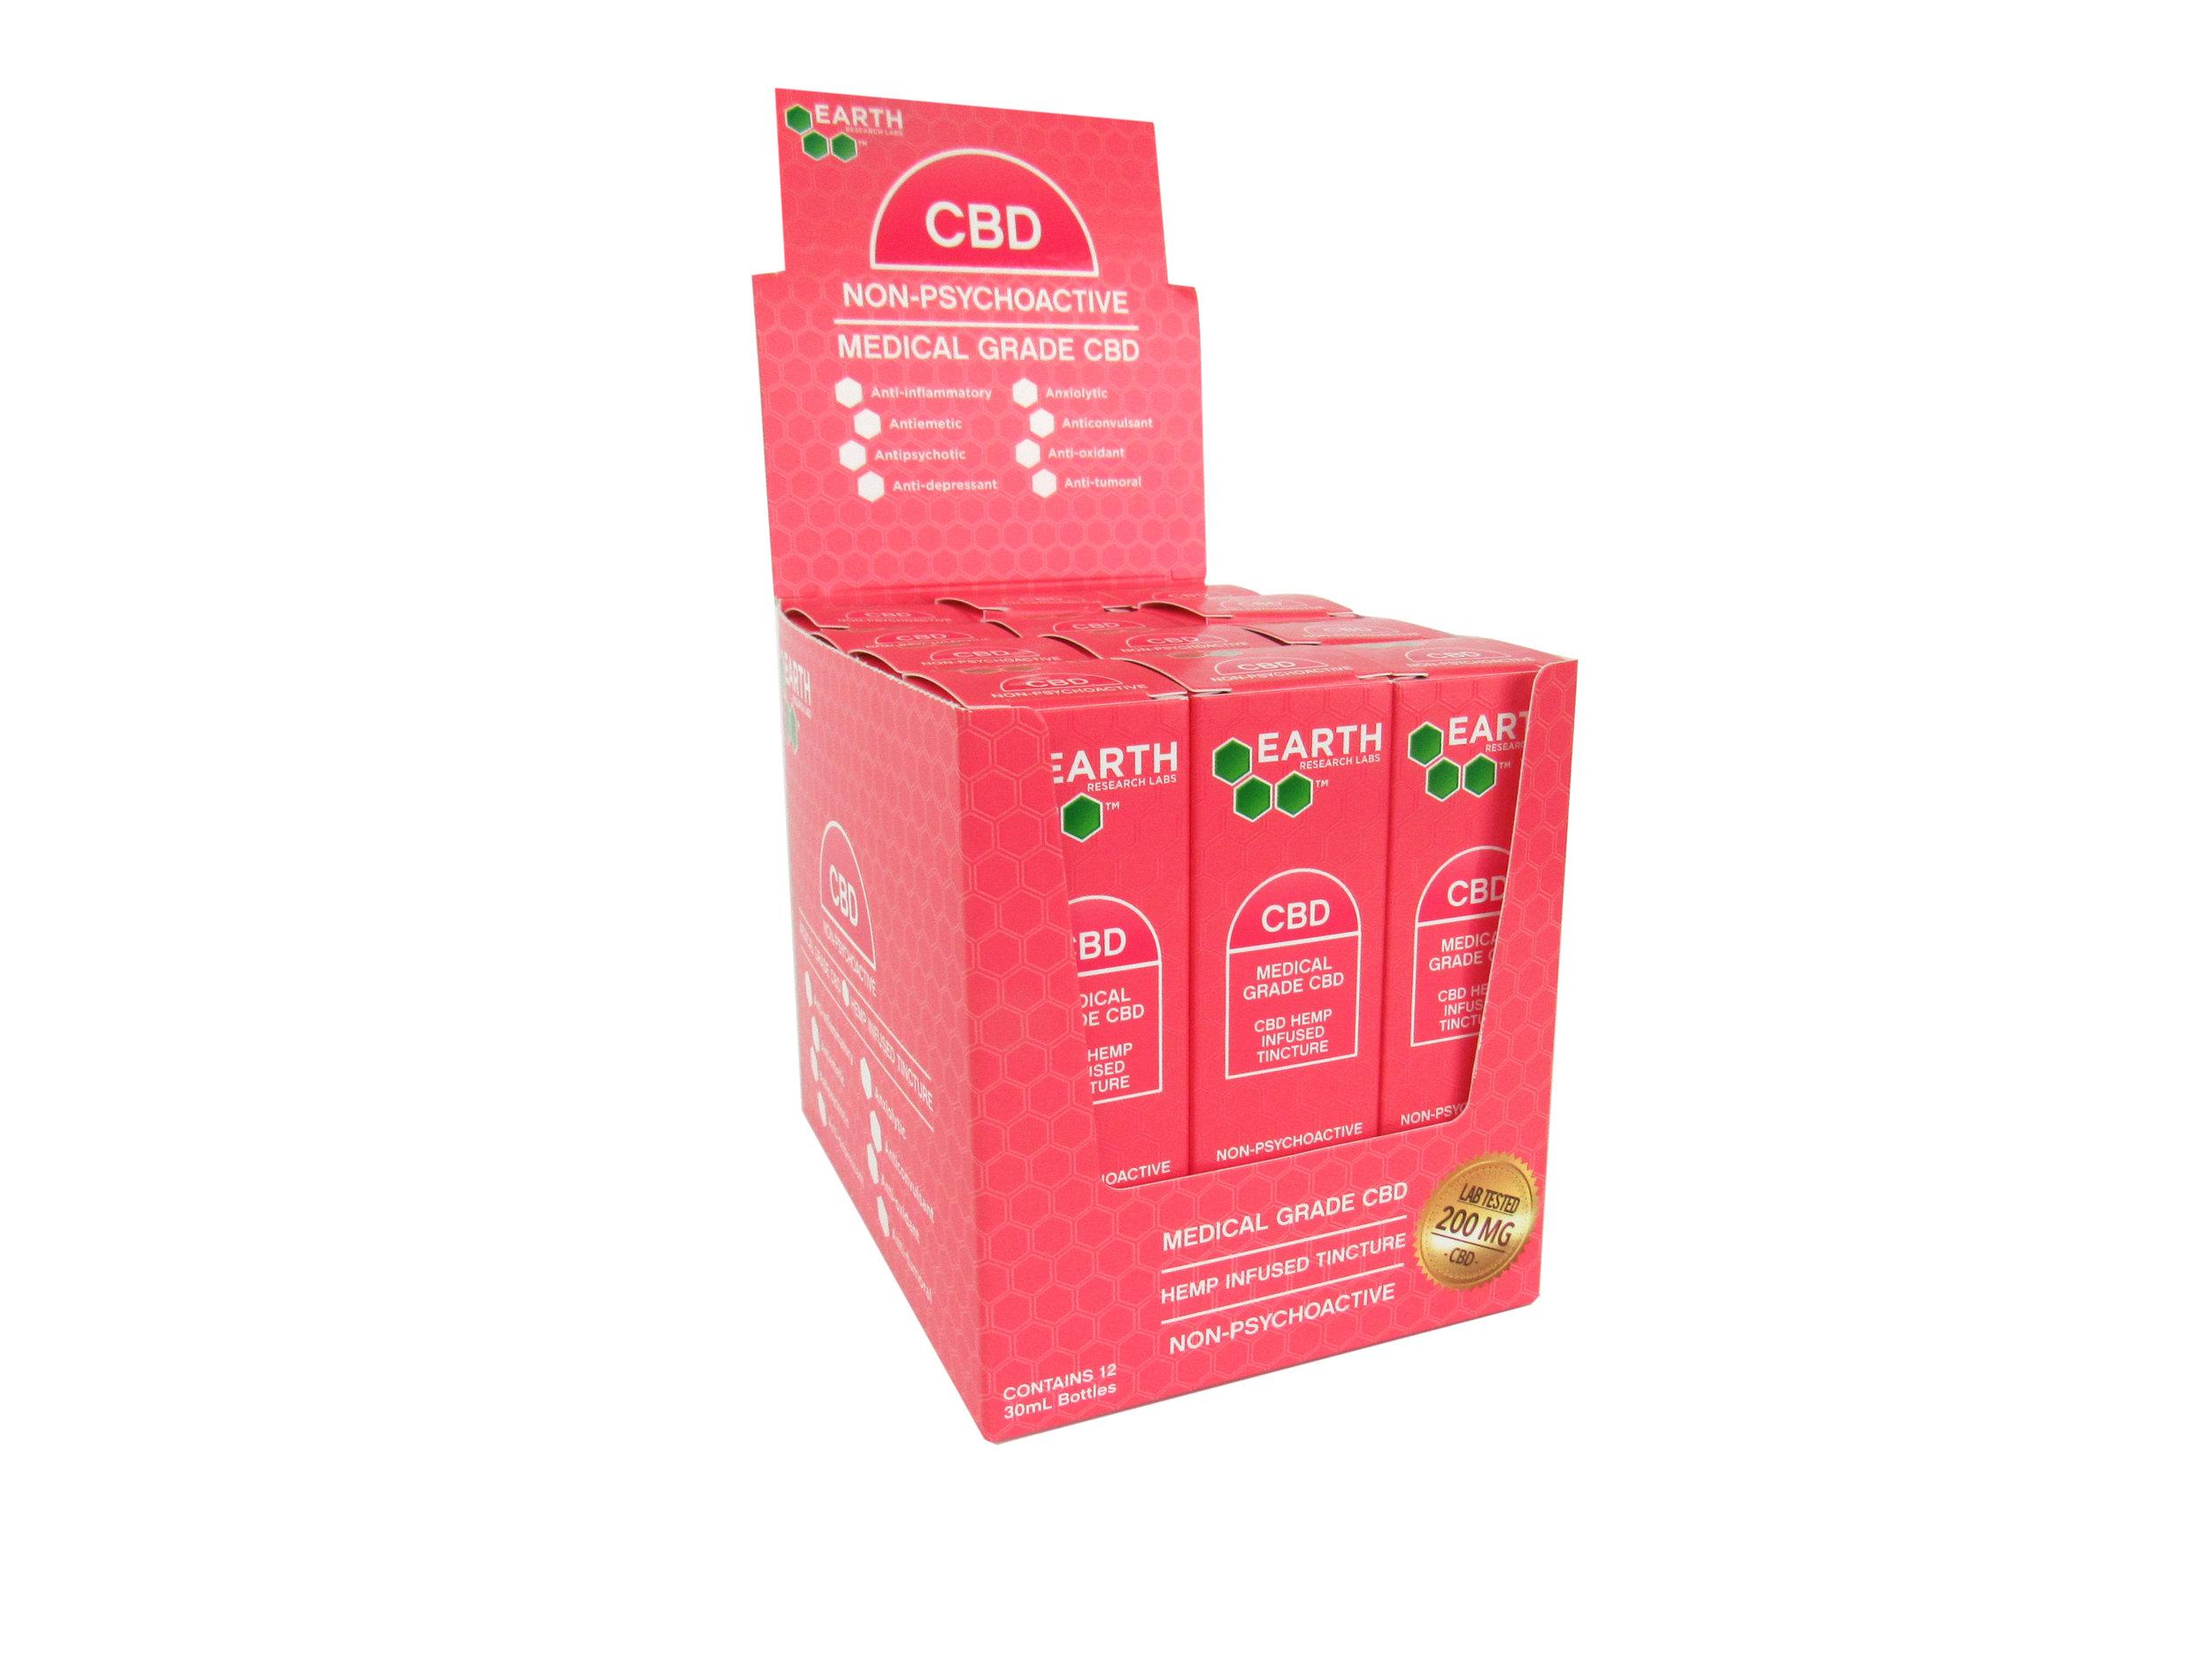 CBD Non-Psychoactive Medical Grade CBD Other Cannabis Packaging